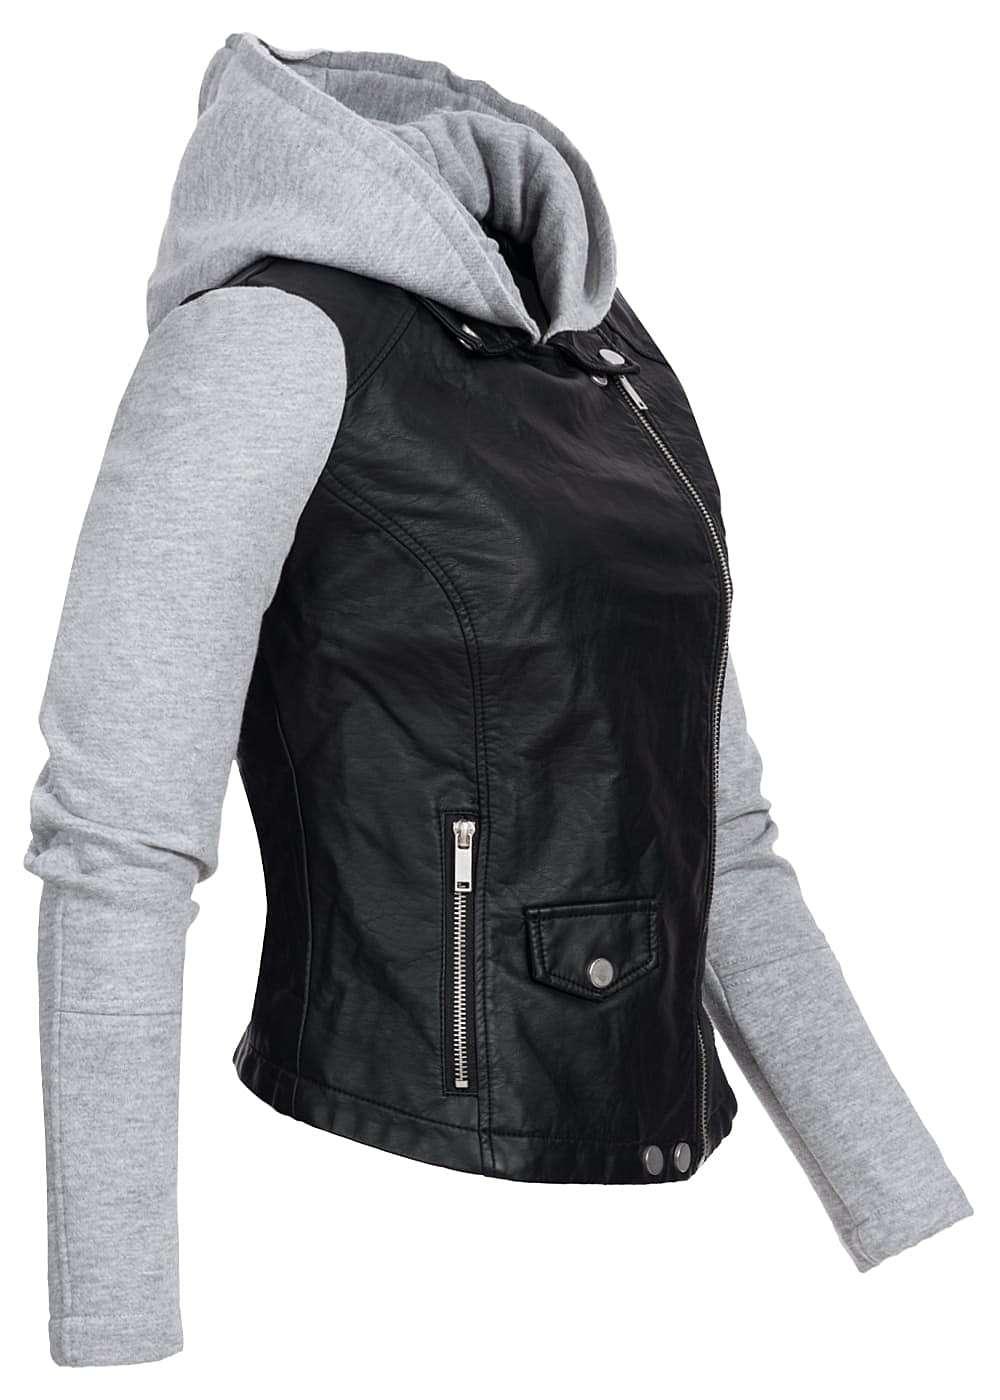 styleboom fashion damen kunstleder jacke kapuze zipper seitlich schwarz grau 77onlineshop. Black Bedroom Furniture Sets. Home Design Ideas